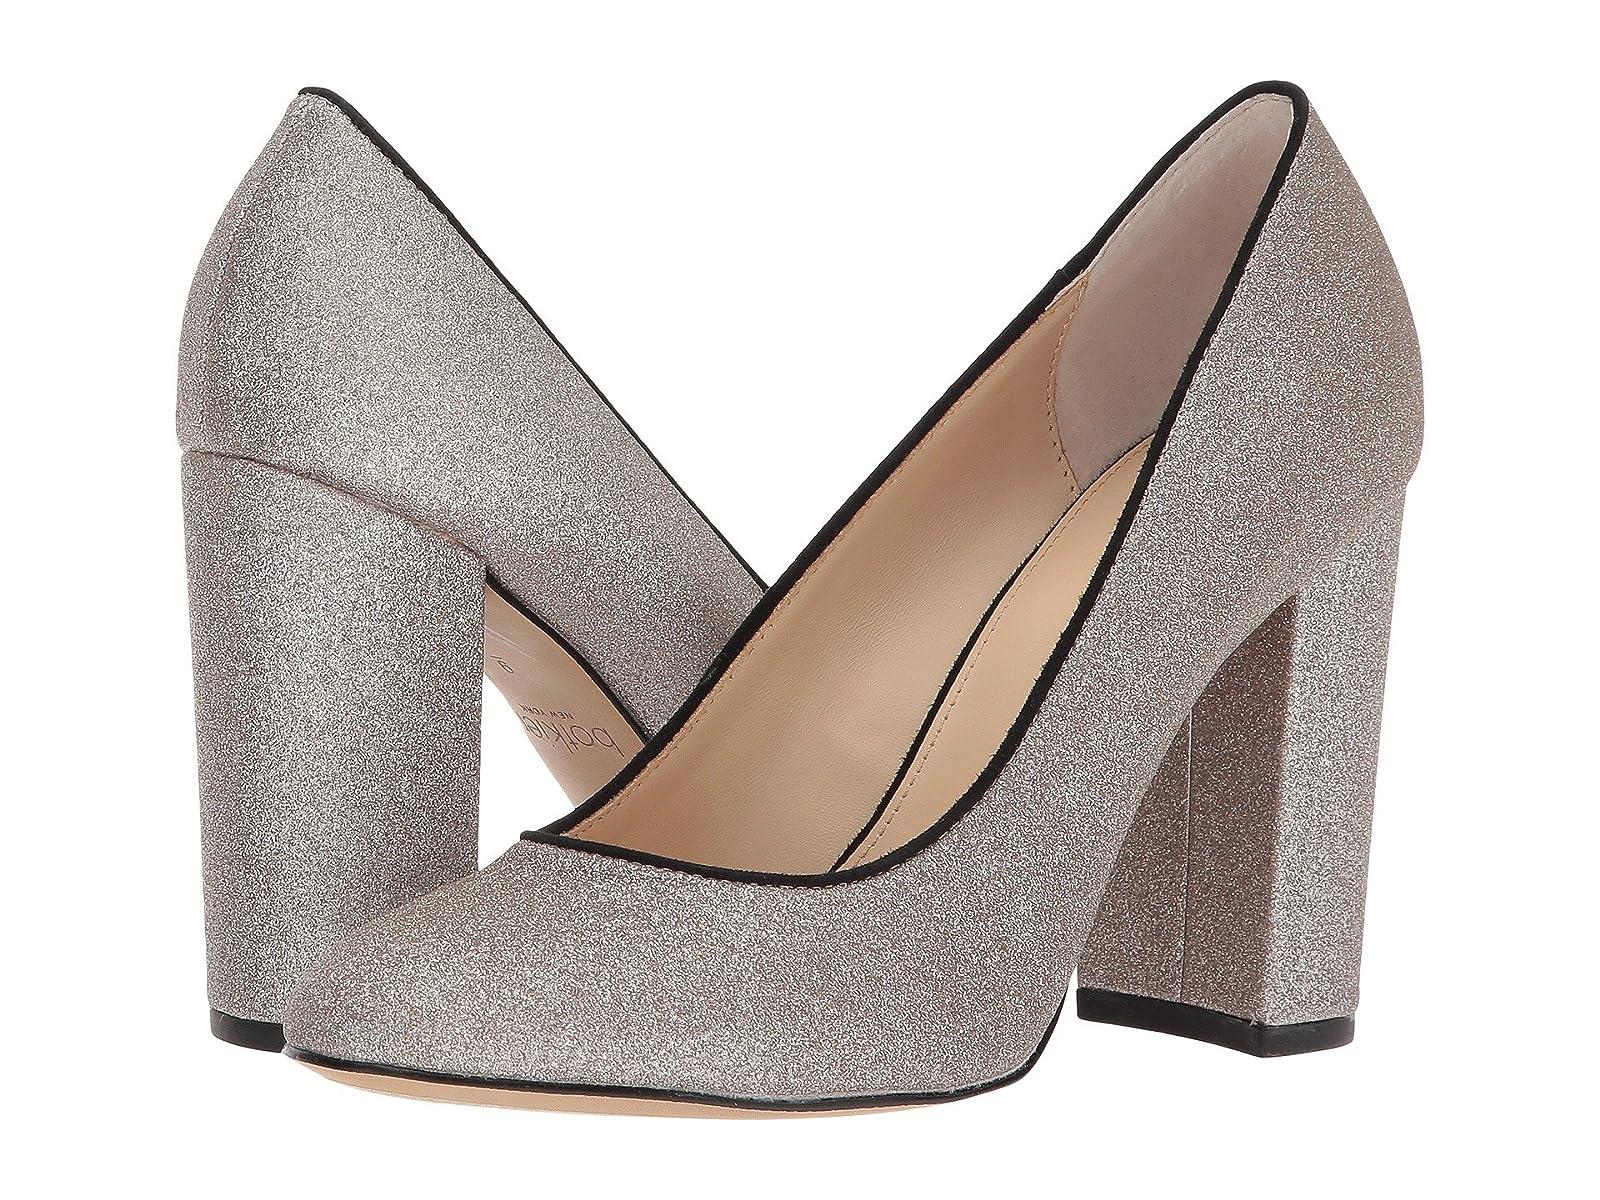 Botkier ValentinaAtmospheric grades have affordable shoes